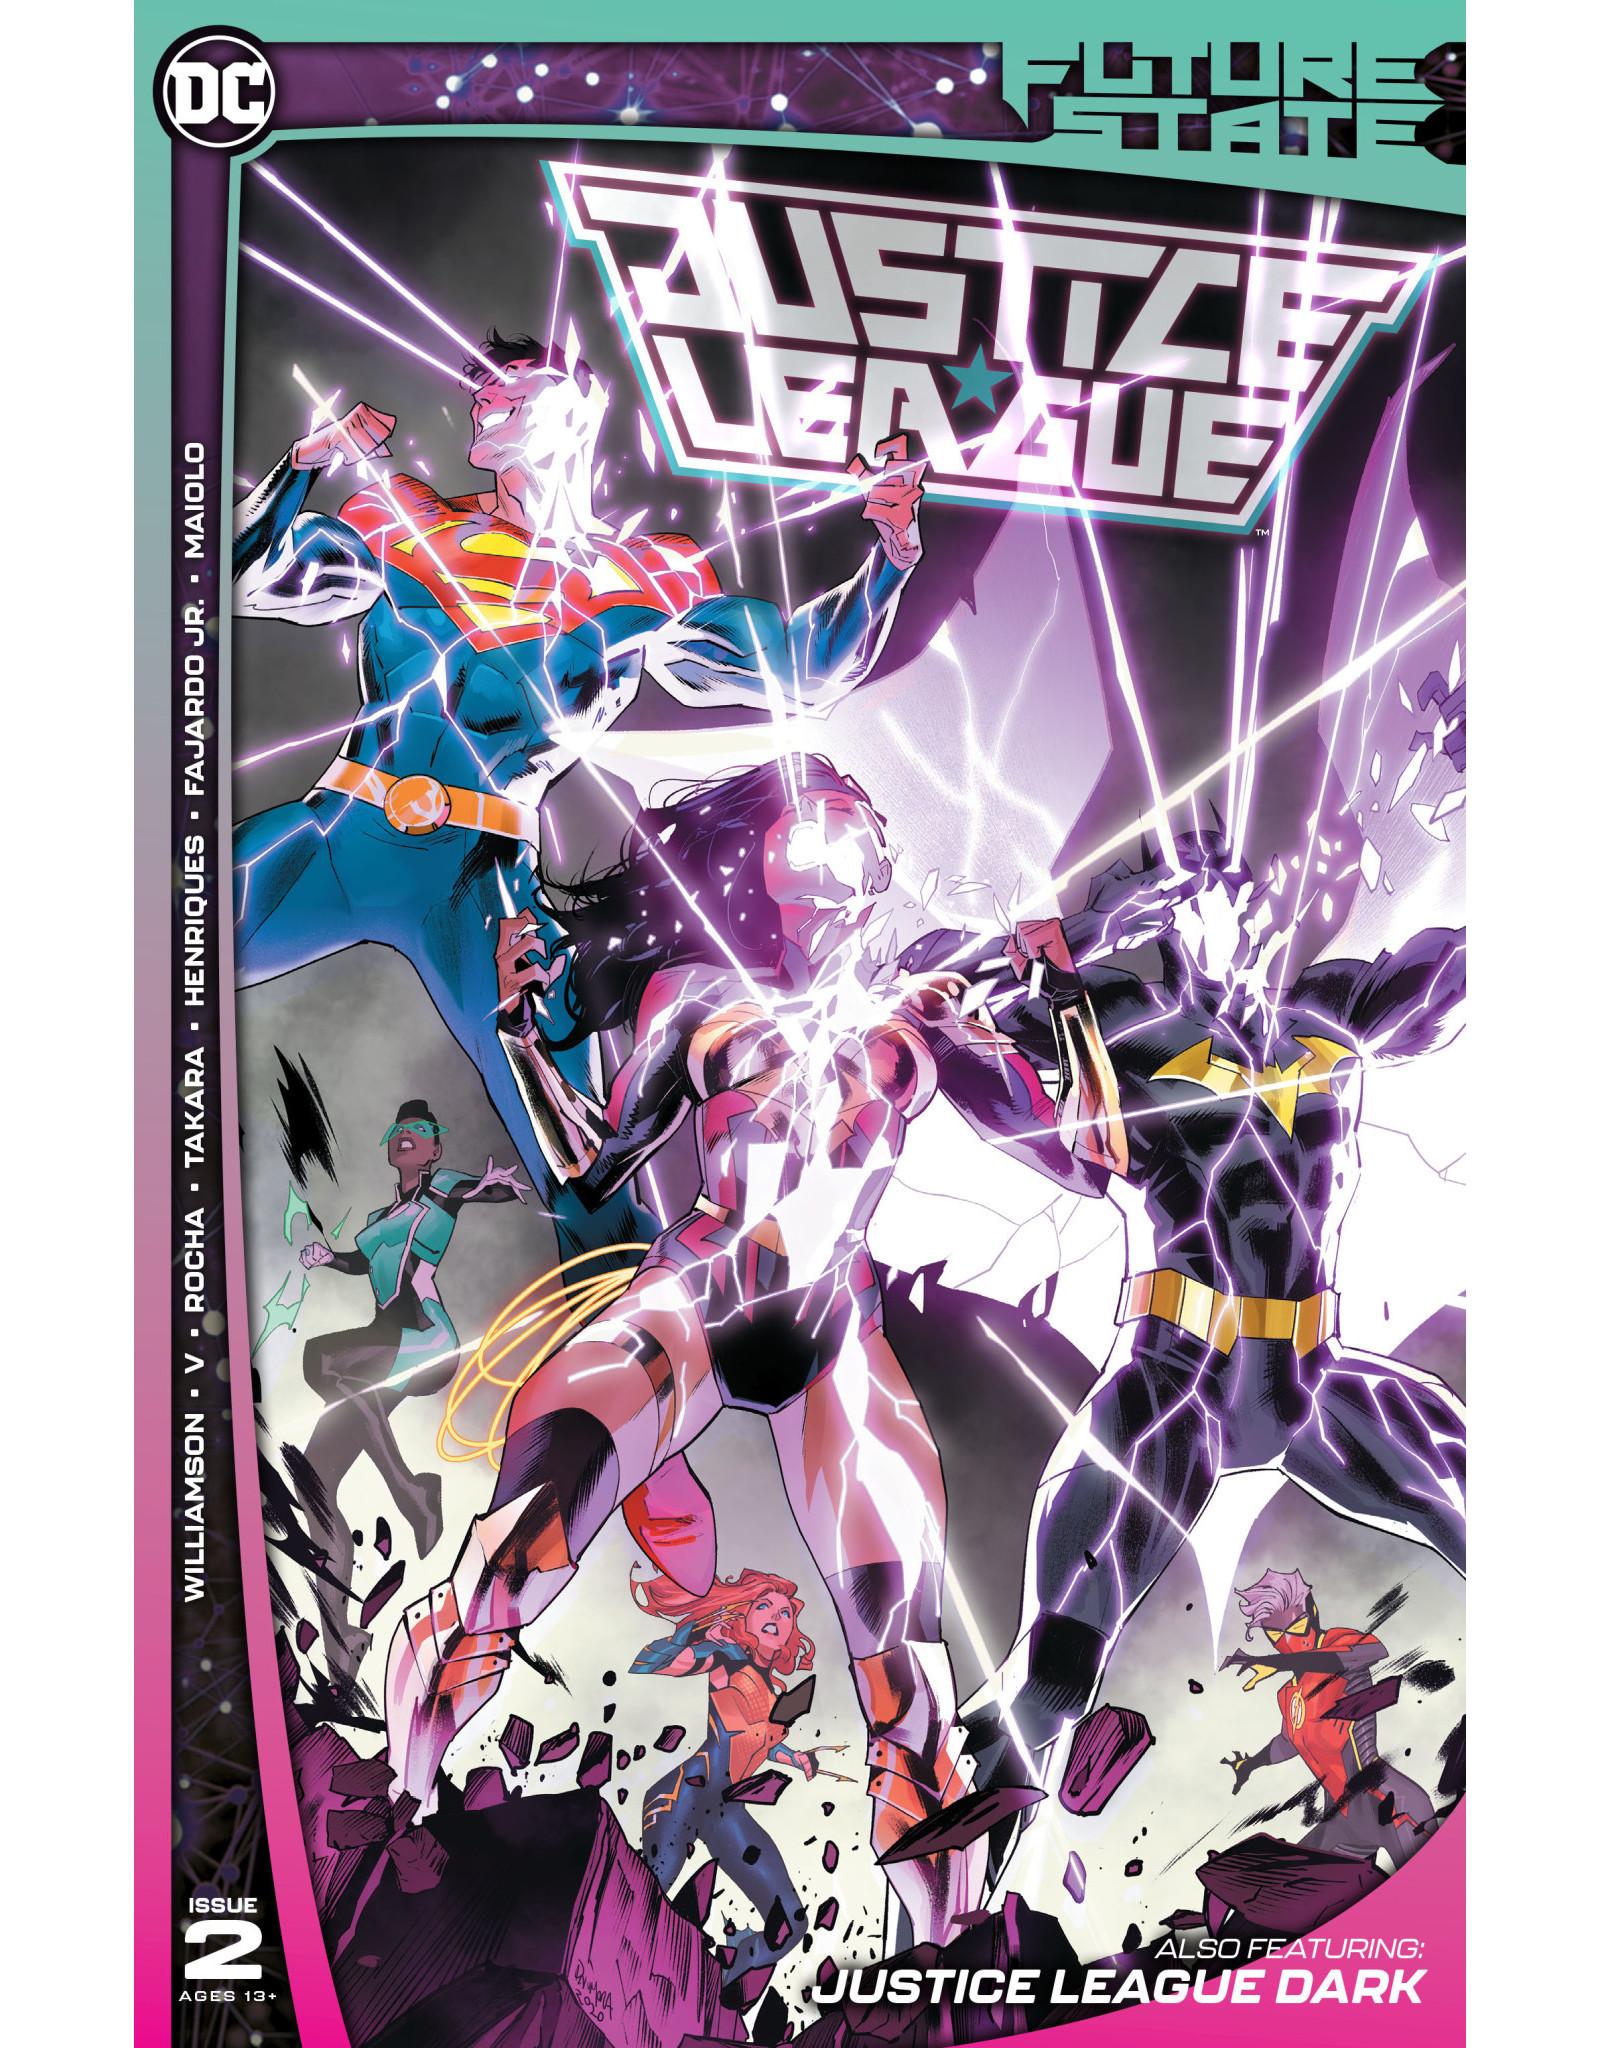 DC Comics FUTURE STATE JUSTICE LEAGUE #2 (OF 2) CVR A DAN MORA